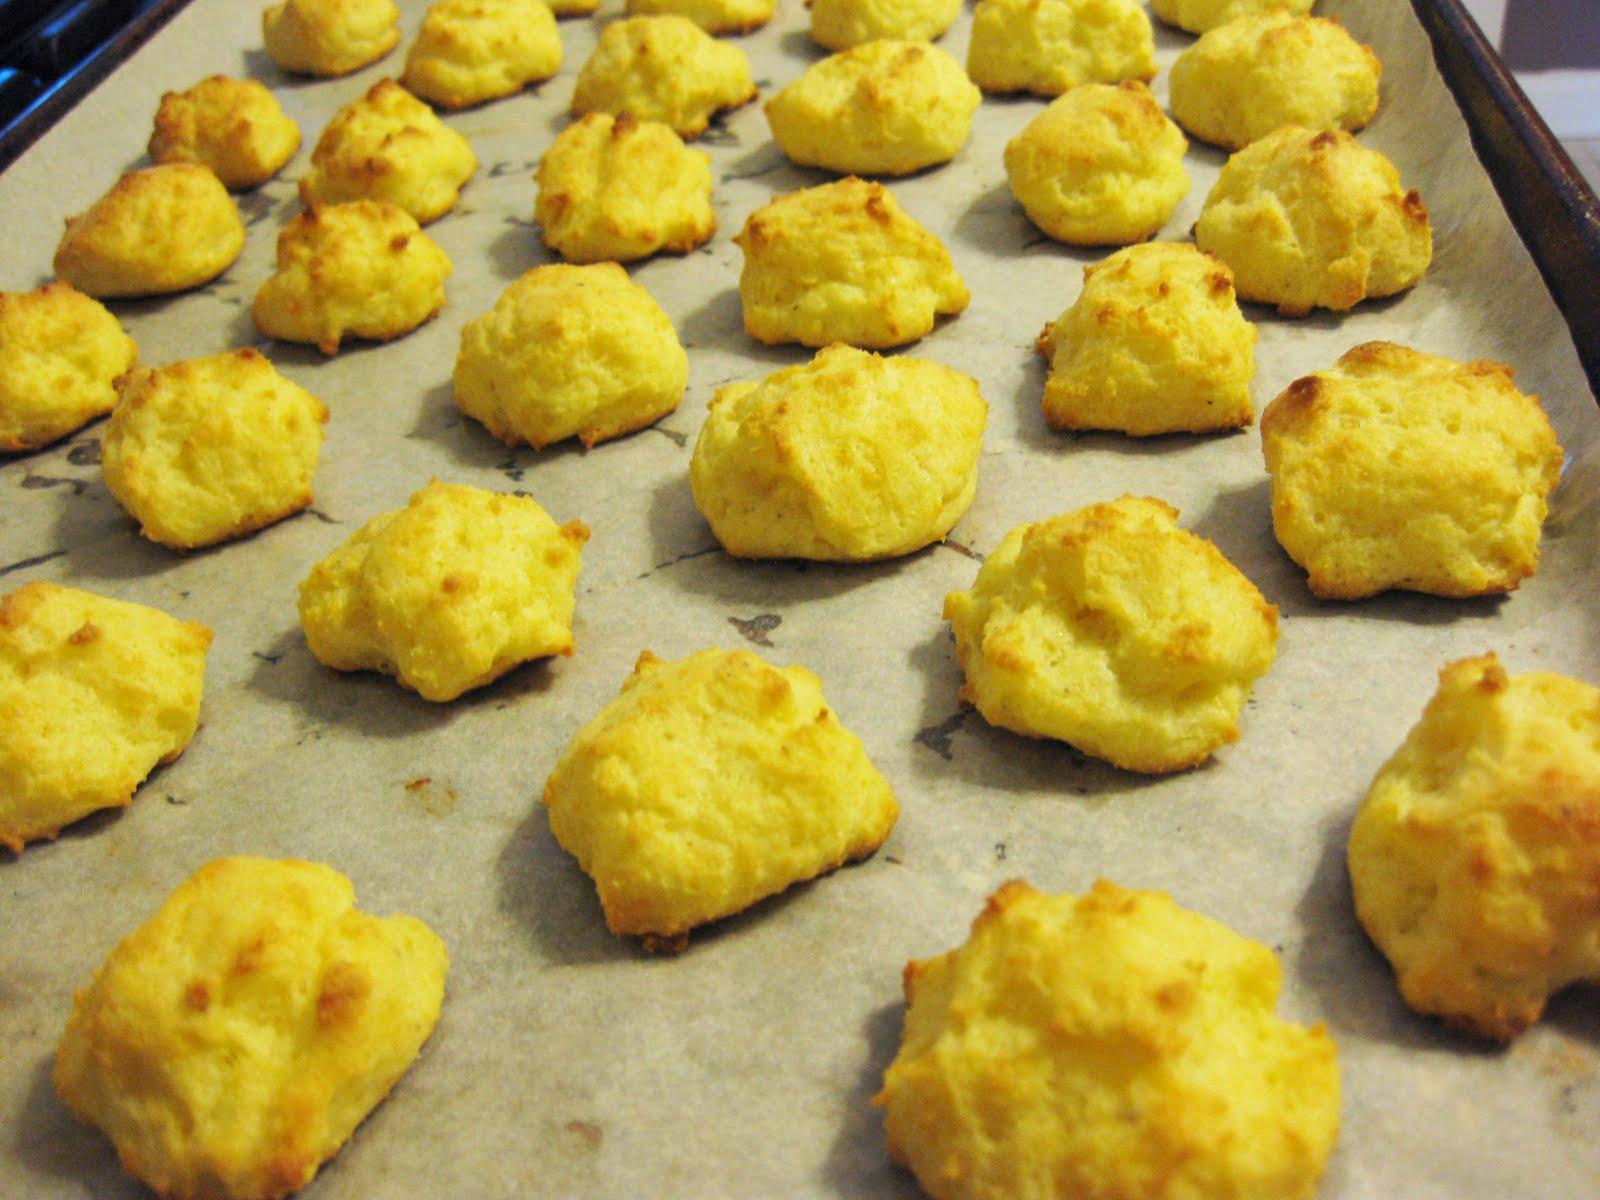 Bloatal Recall: Parmesan Puffs